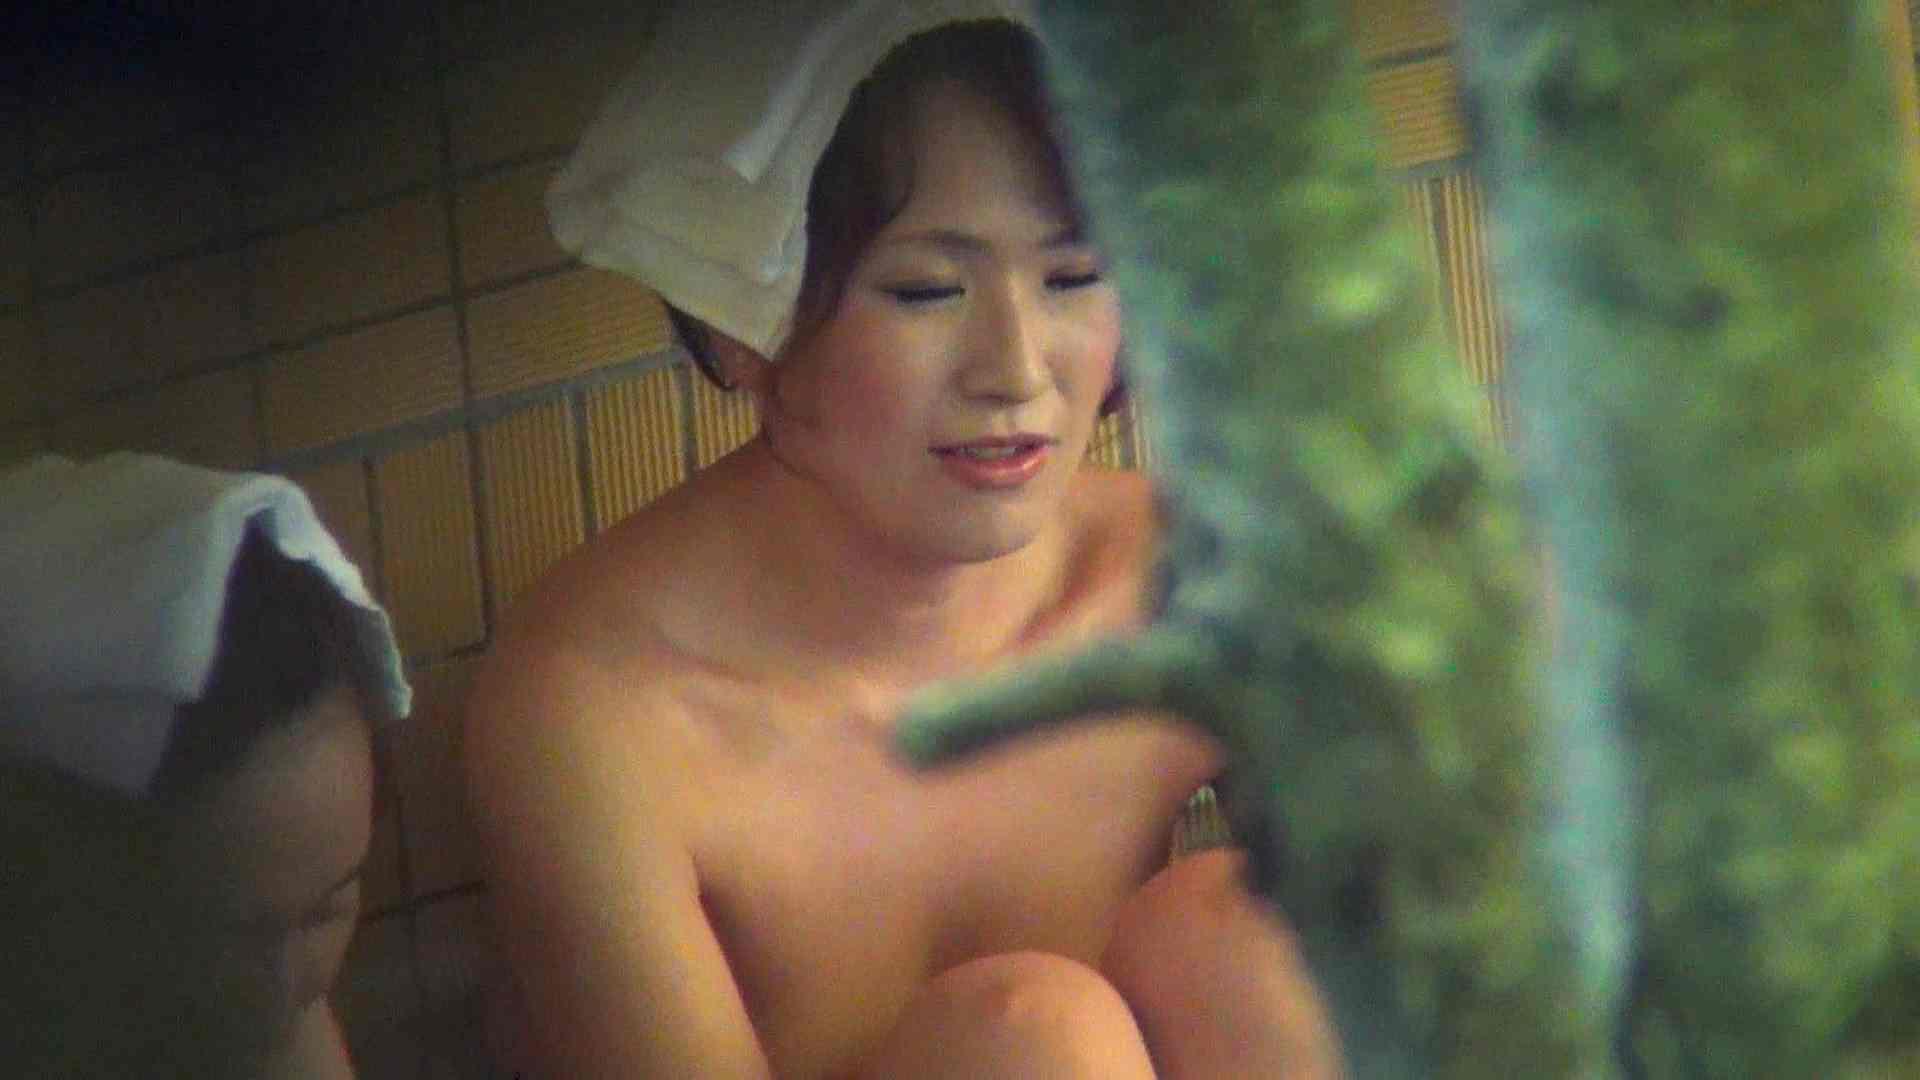 Aquaな露天風呂Vol.272 盗撮シリーズ | 露天風呂編  106PIX 9